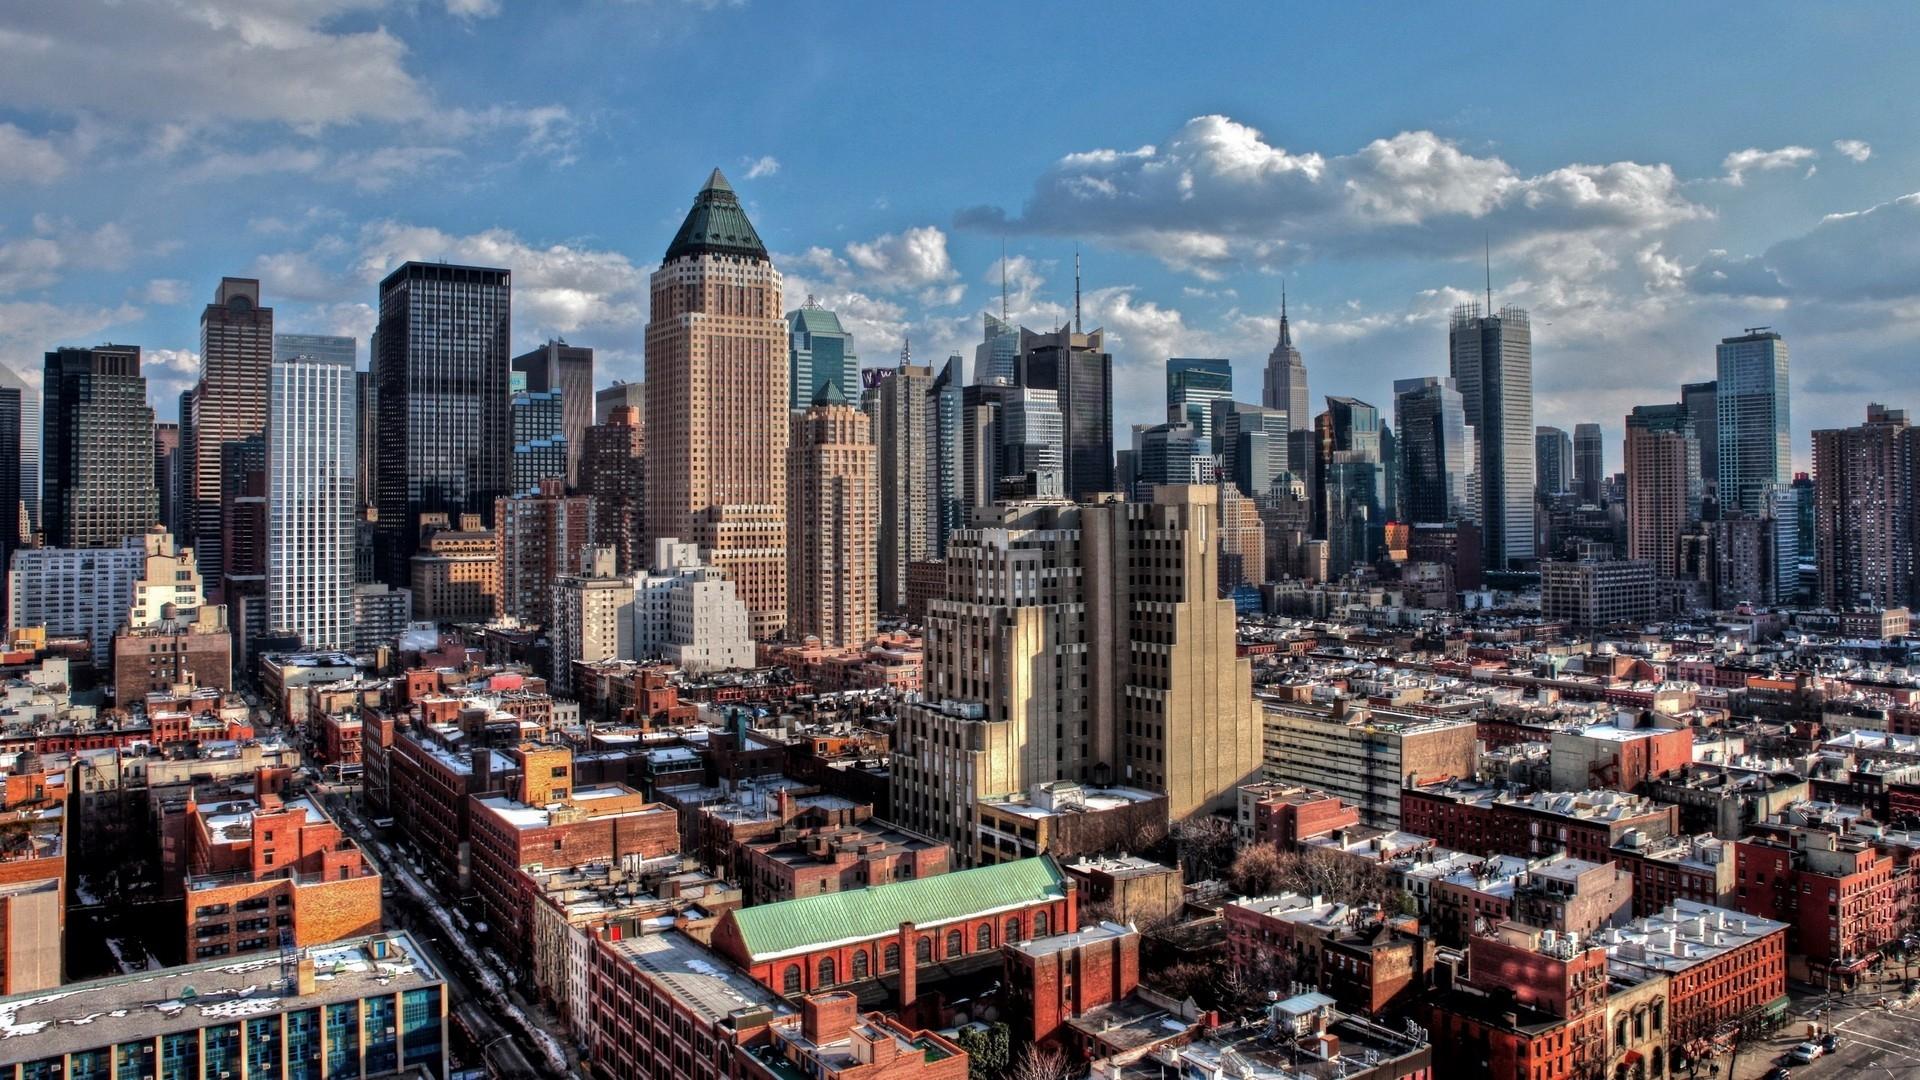 wallpaper : new york, manhattan, skyscrapers, hdr 1920x1080